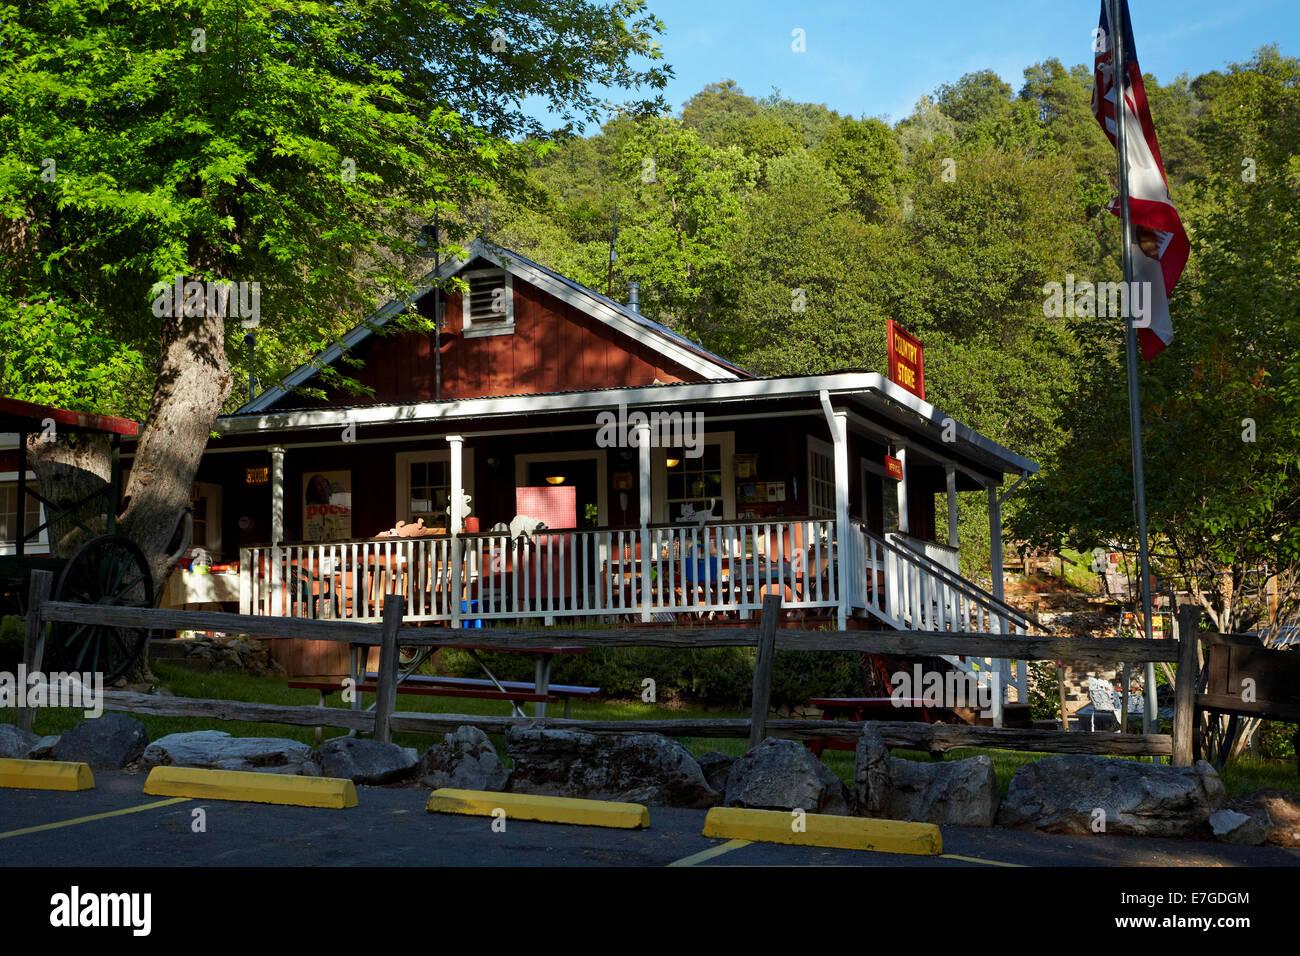 Shop at 49er RV Ranch, Columbia, Tuolumne County, Sierra Nevada foothills, California, USA - Stock Image